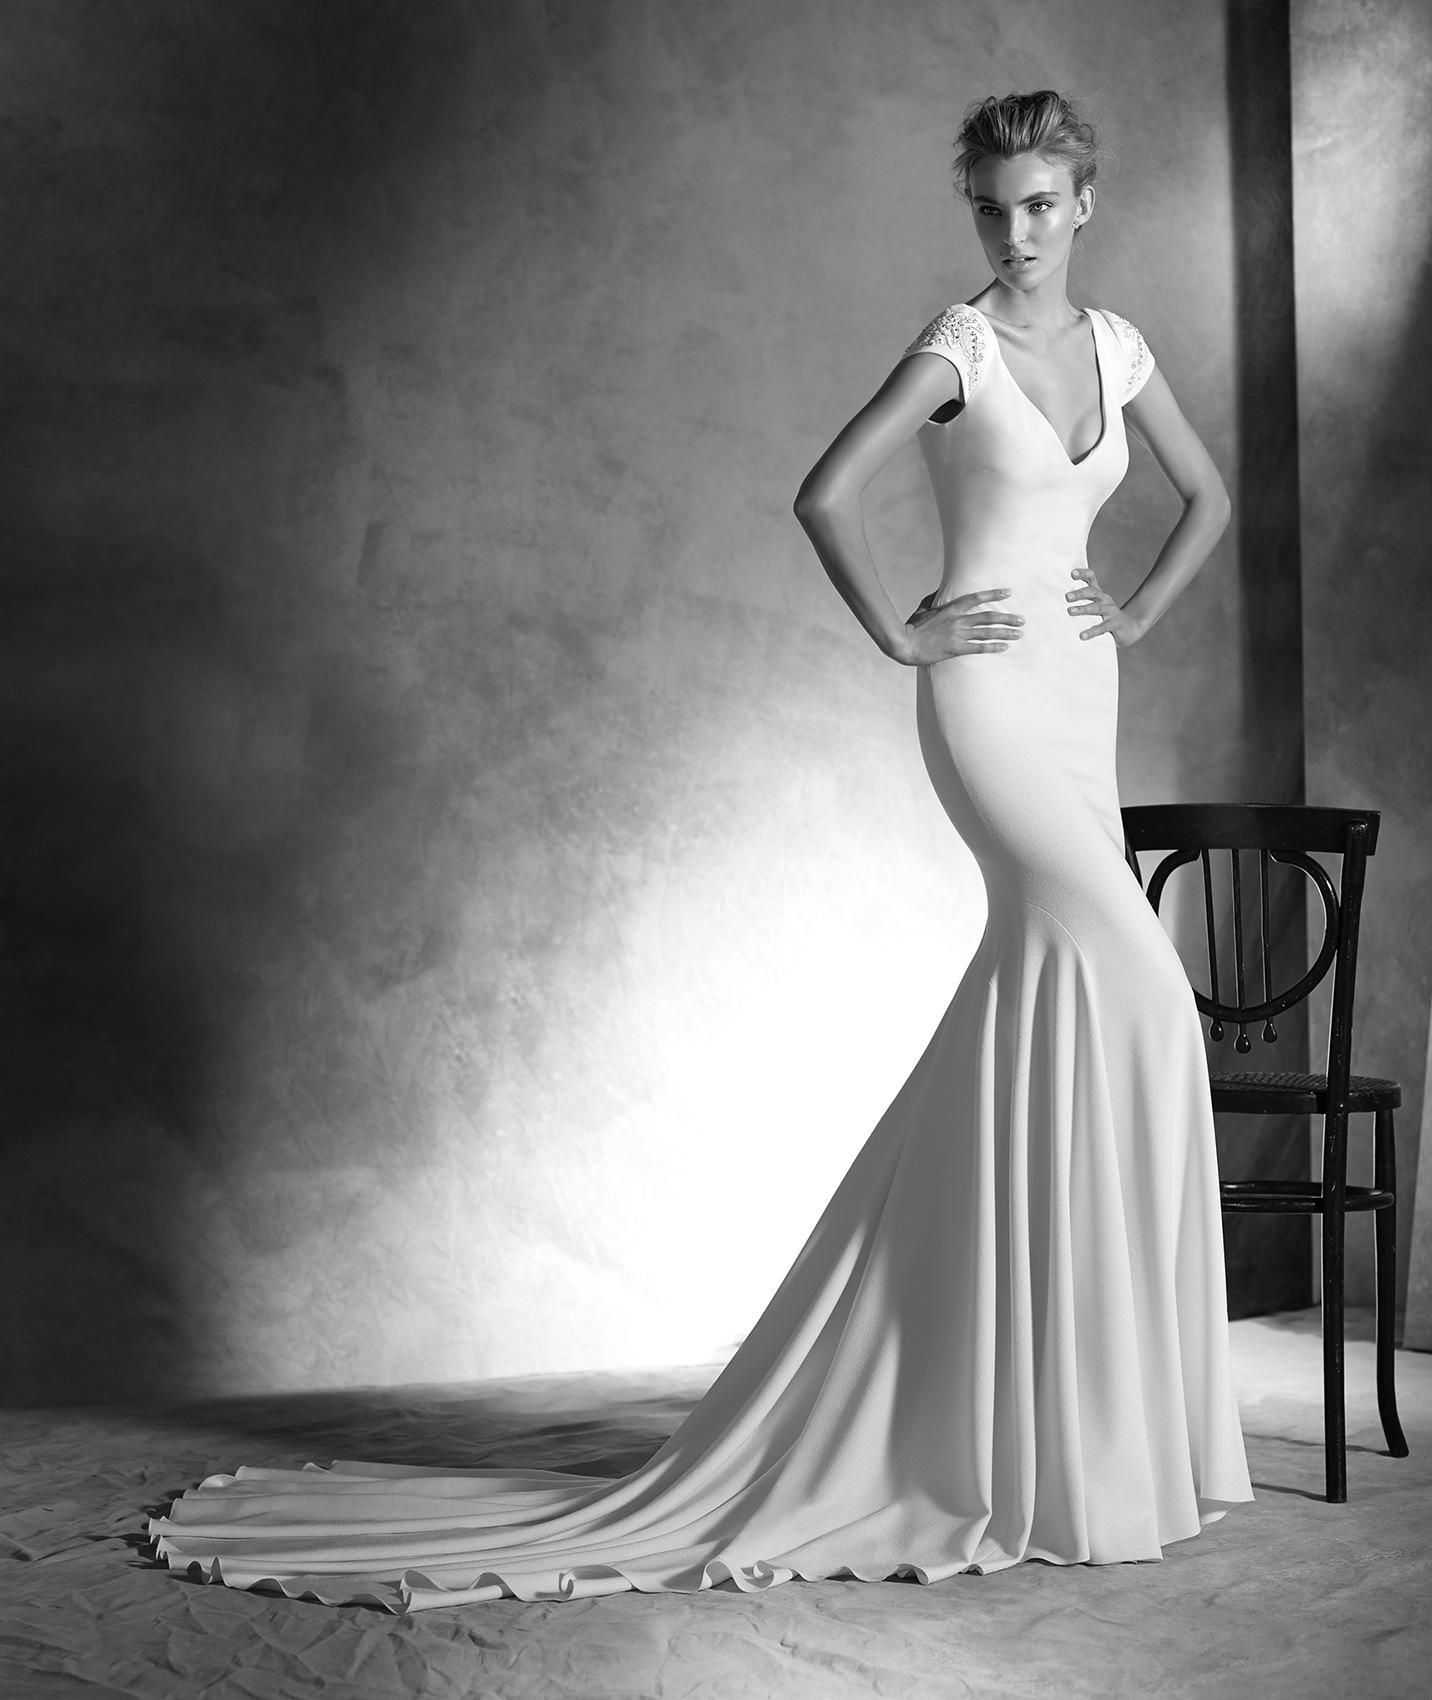 6506cd6c9 elblogdeanasuero-avance-vestidos-novia-2016-pronovias-atelier-corte-sirena -con-escote-en-la-espalda-y-escote-pico-irune.jpg